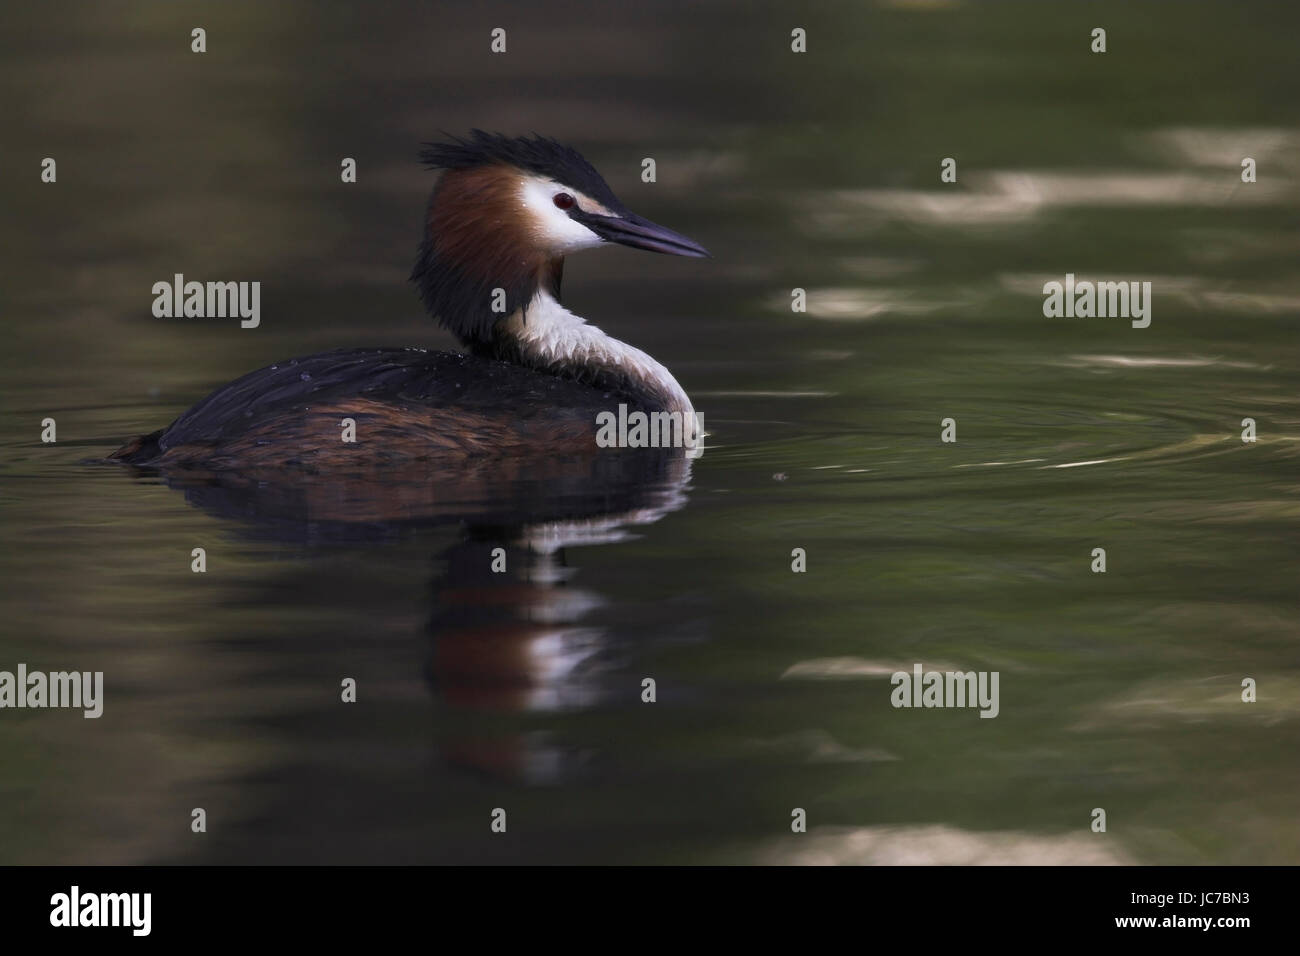 Bonnet diver, Podiceps cristatus, Great Crested Grebe, birds, cloth divers, Stei?f??er, Podicipediformes, Podicipedidae, - Stock Image